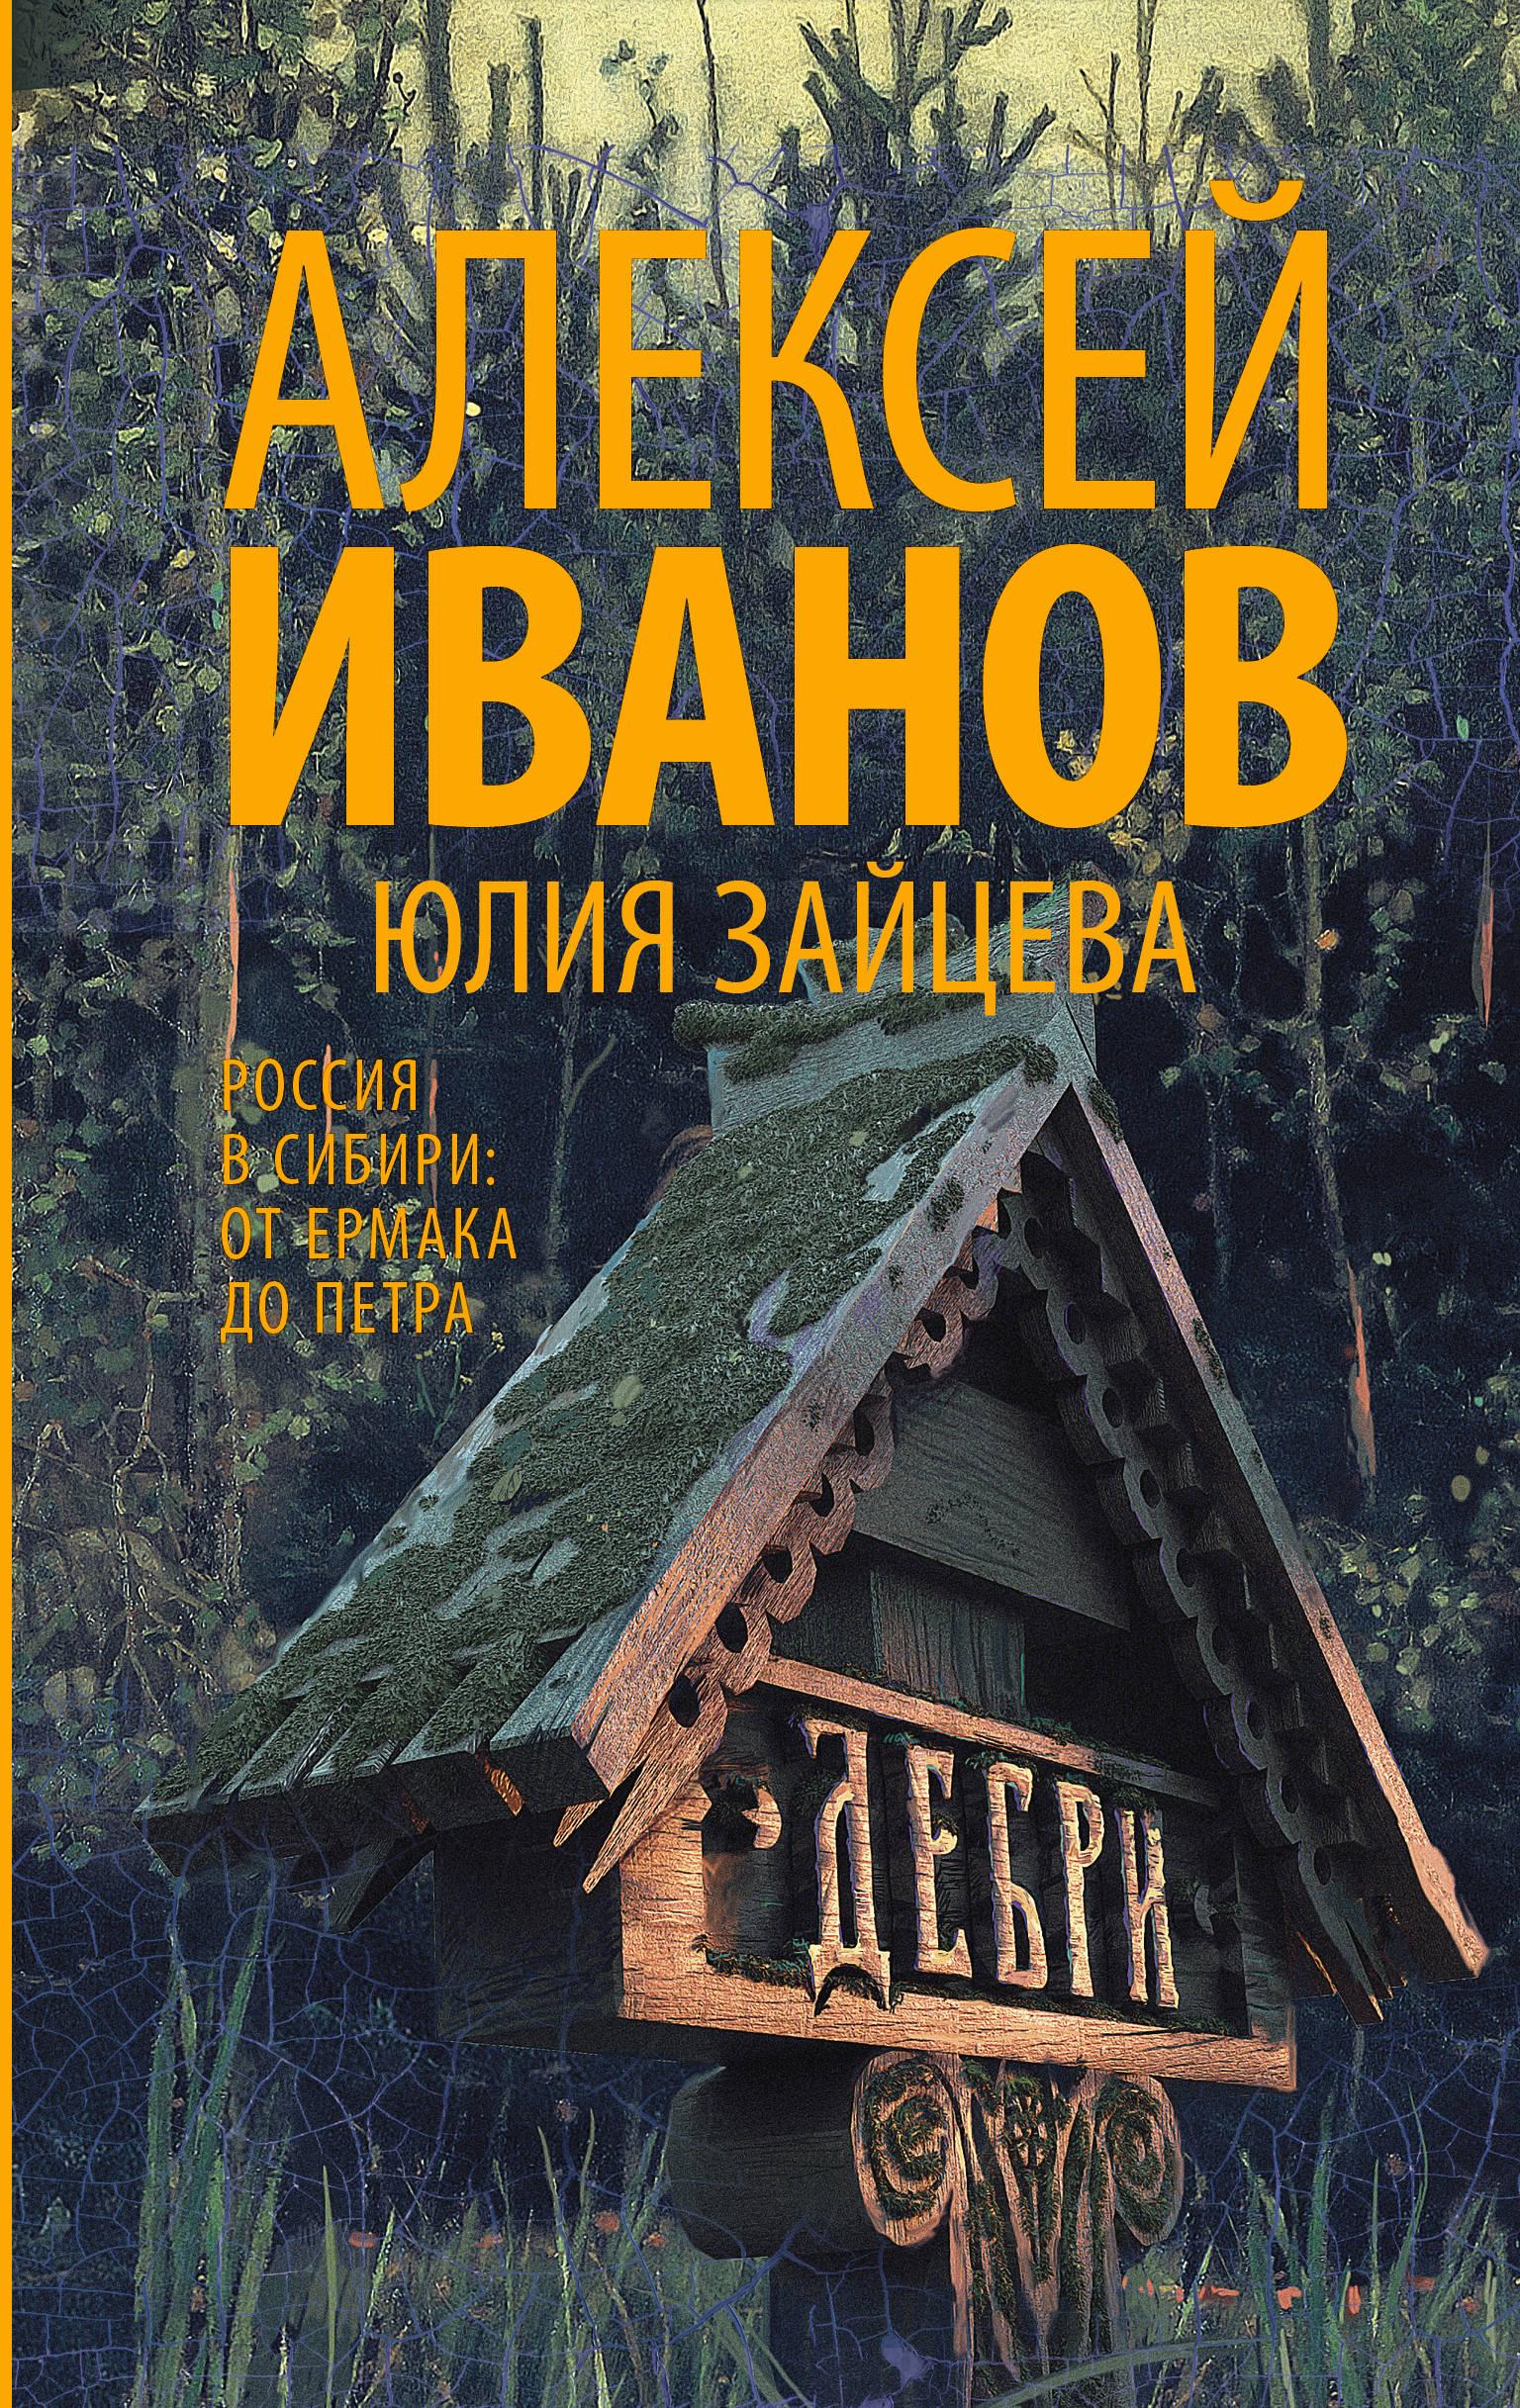 Юлия Зайцева,Алексей Иванов Дебри